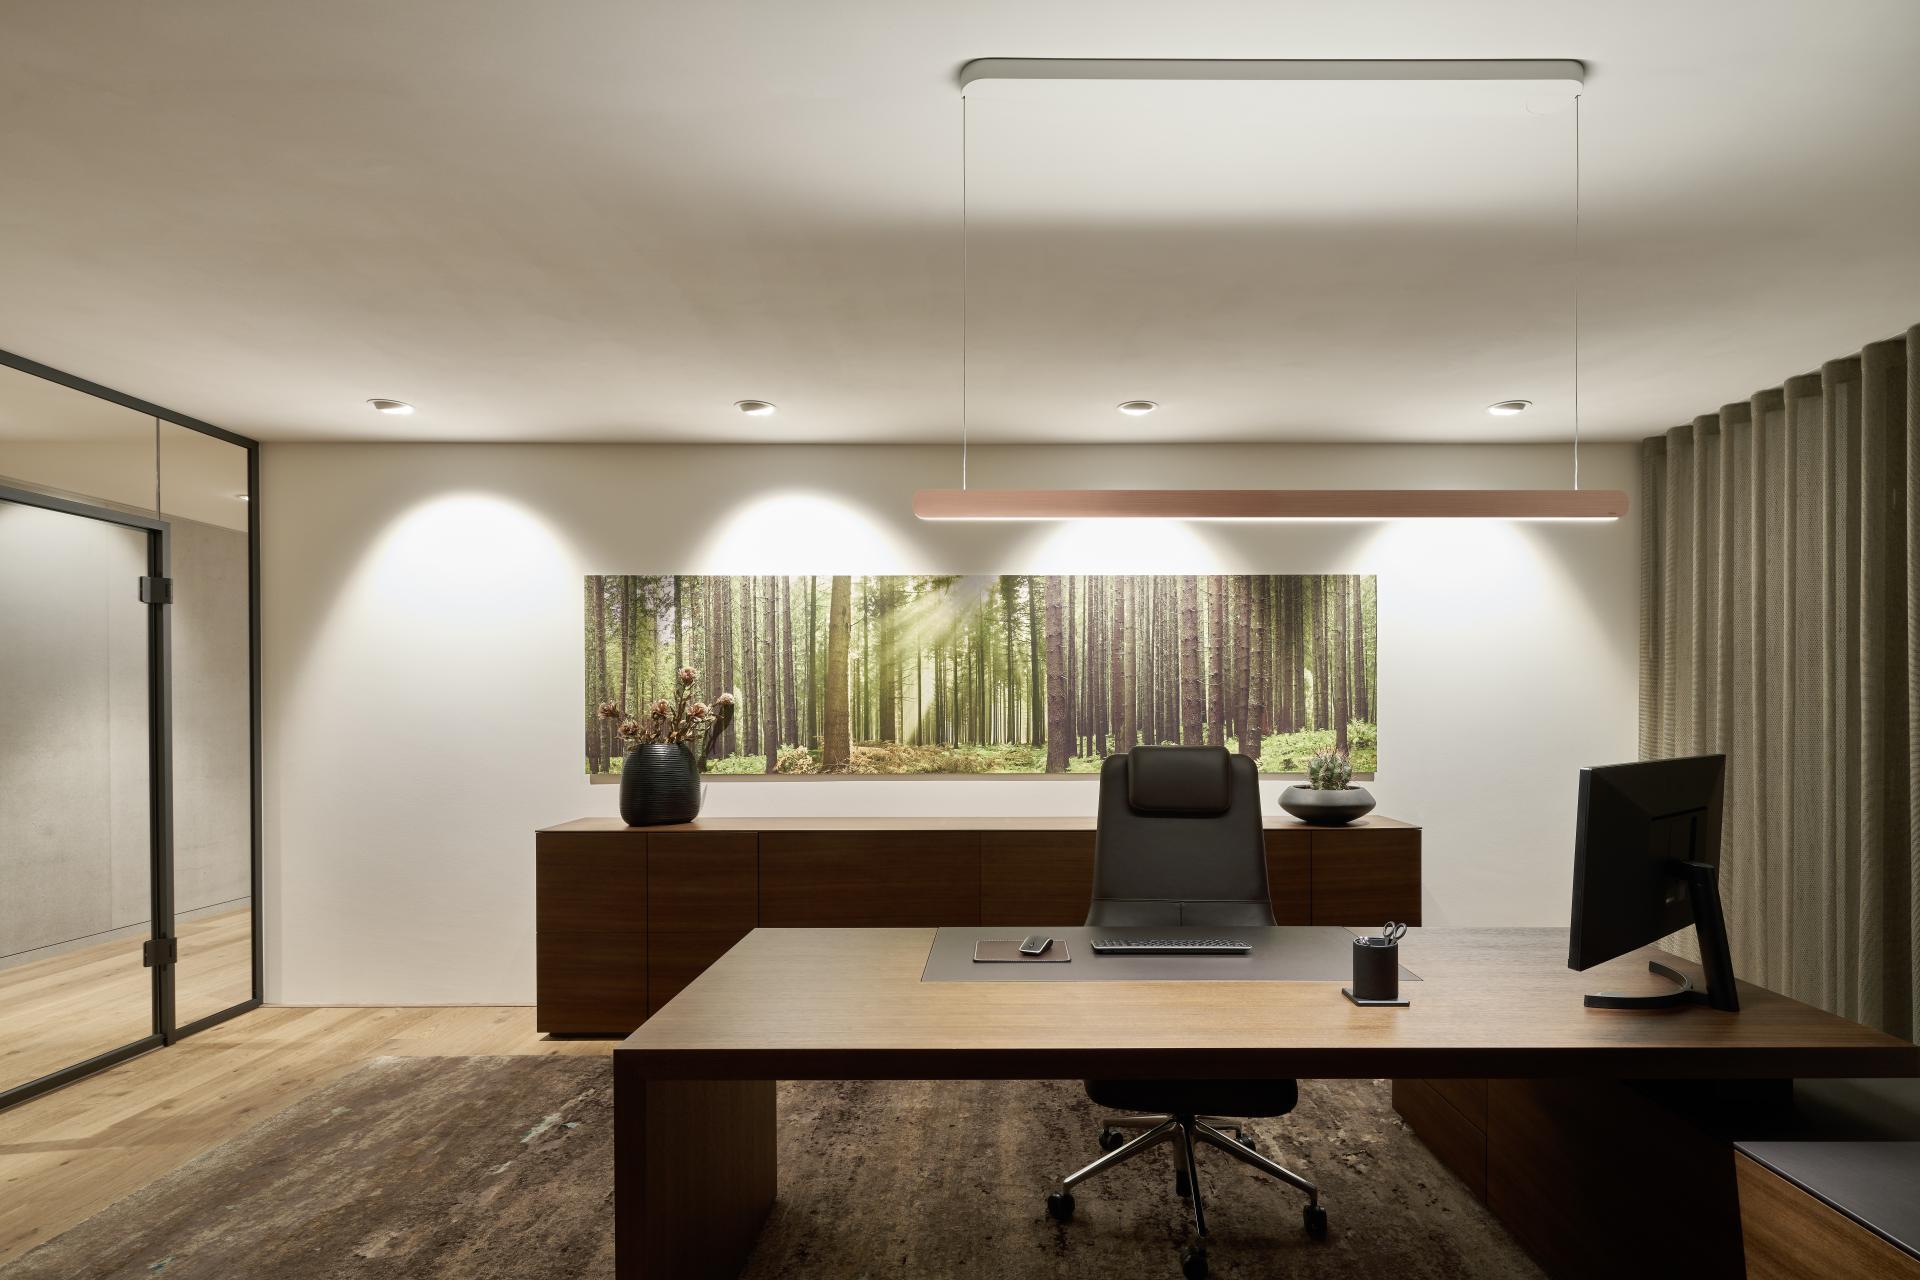 Mito volo taklampe fra Occhio i kontormiljø